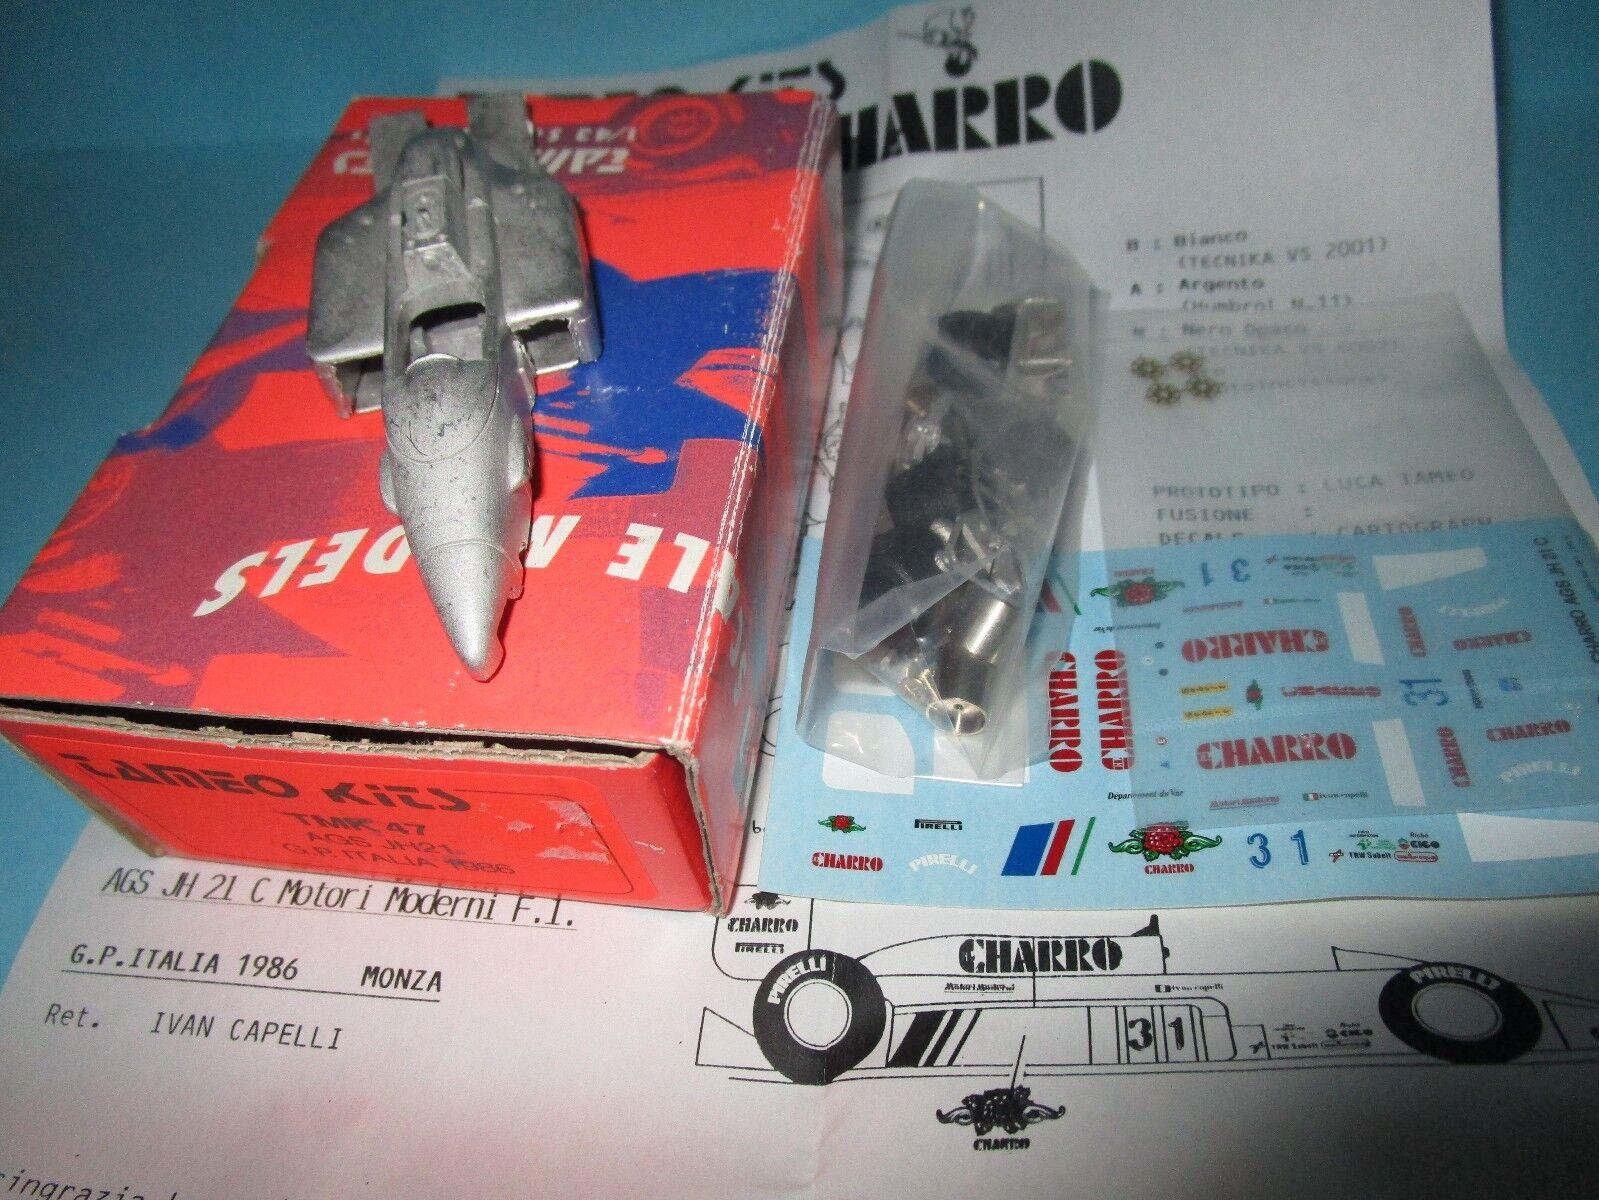 KIT à monter TAMEO F1 AGS JH 21 MOTORI MODERNI GP ITALIE MONZA CAPELLI 1986 1 43